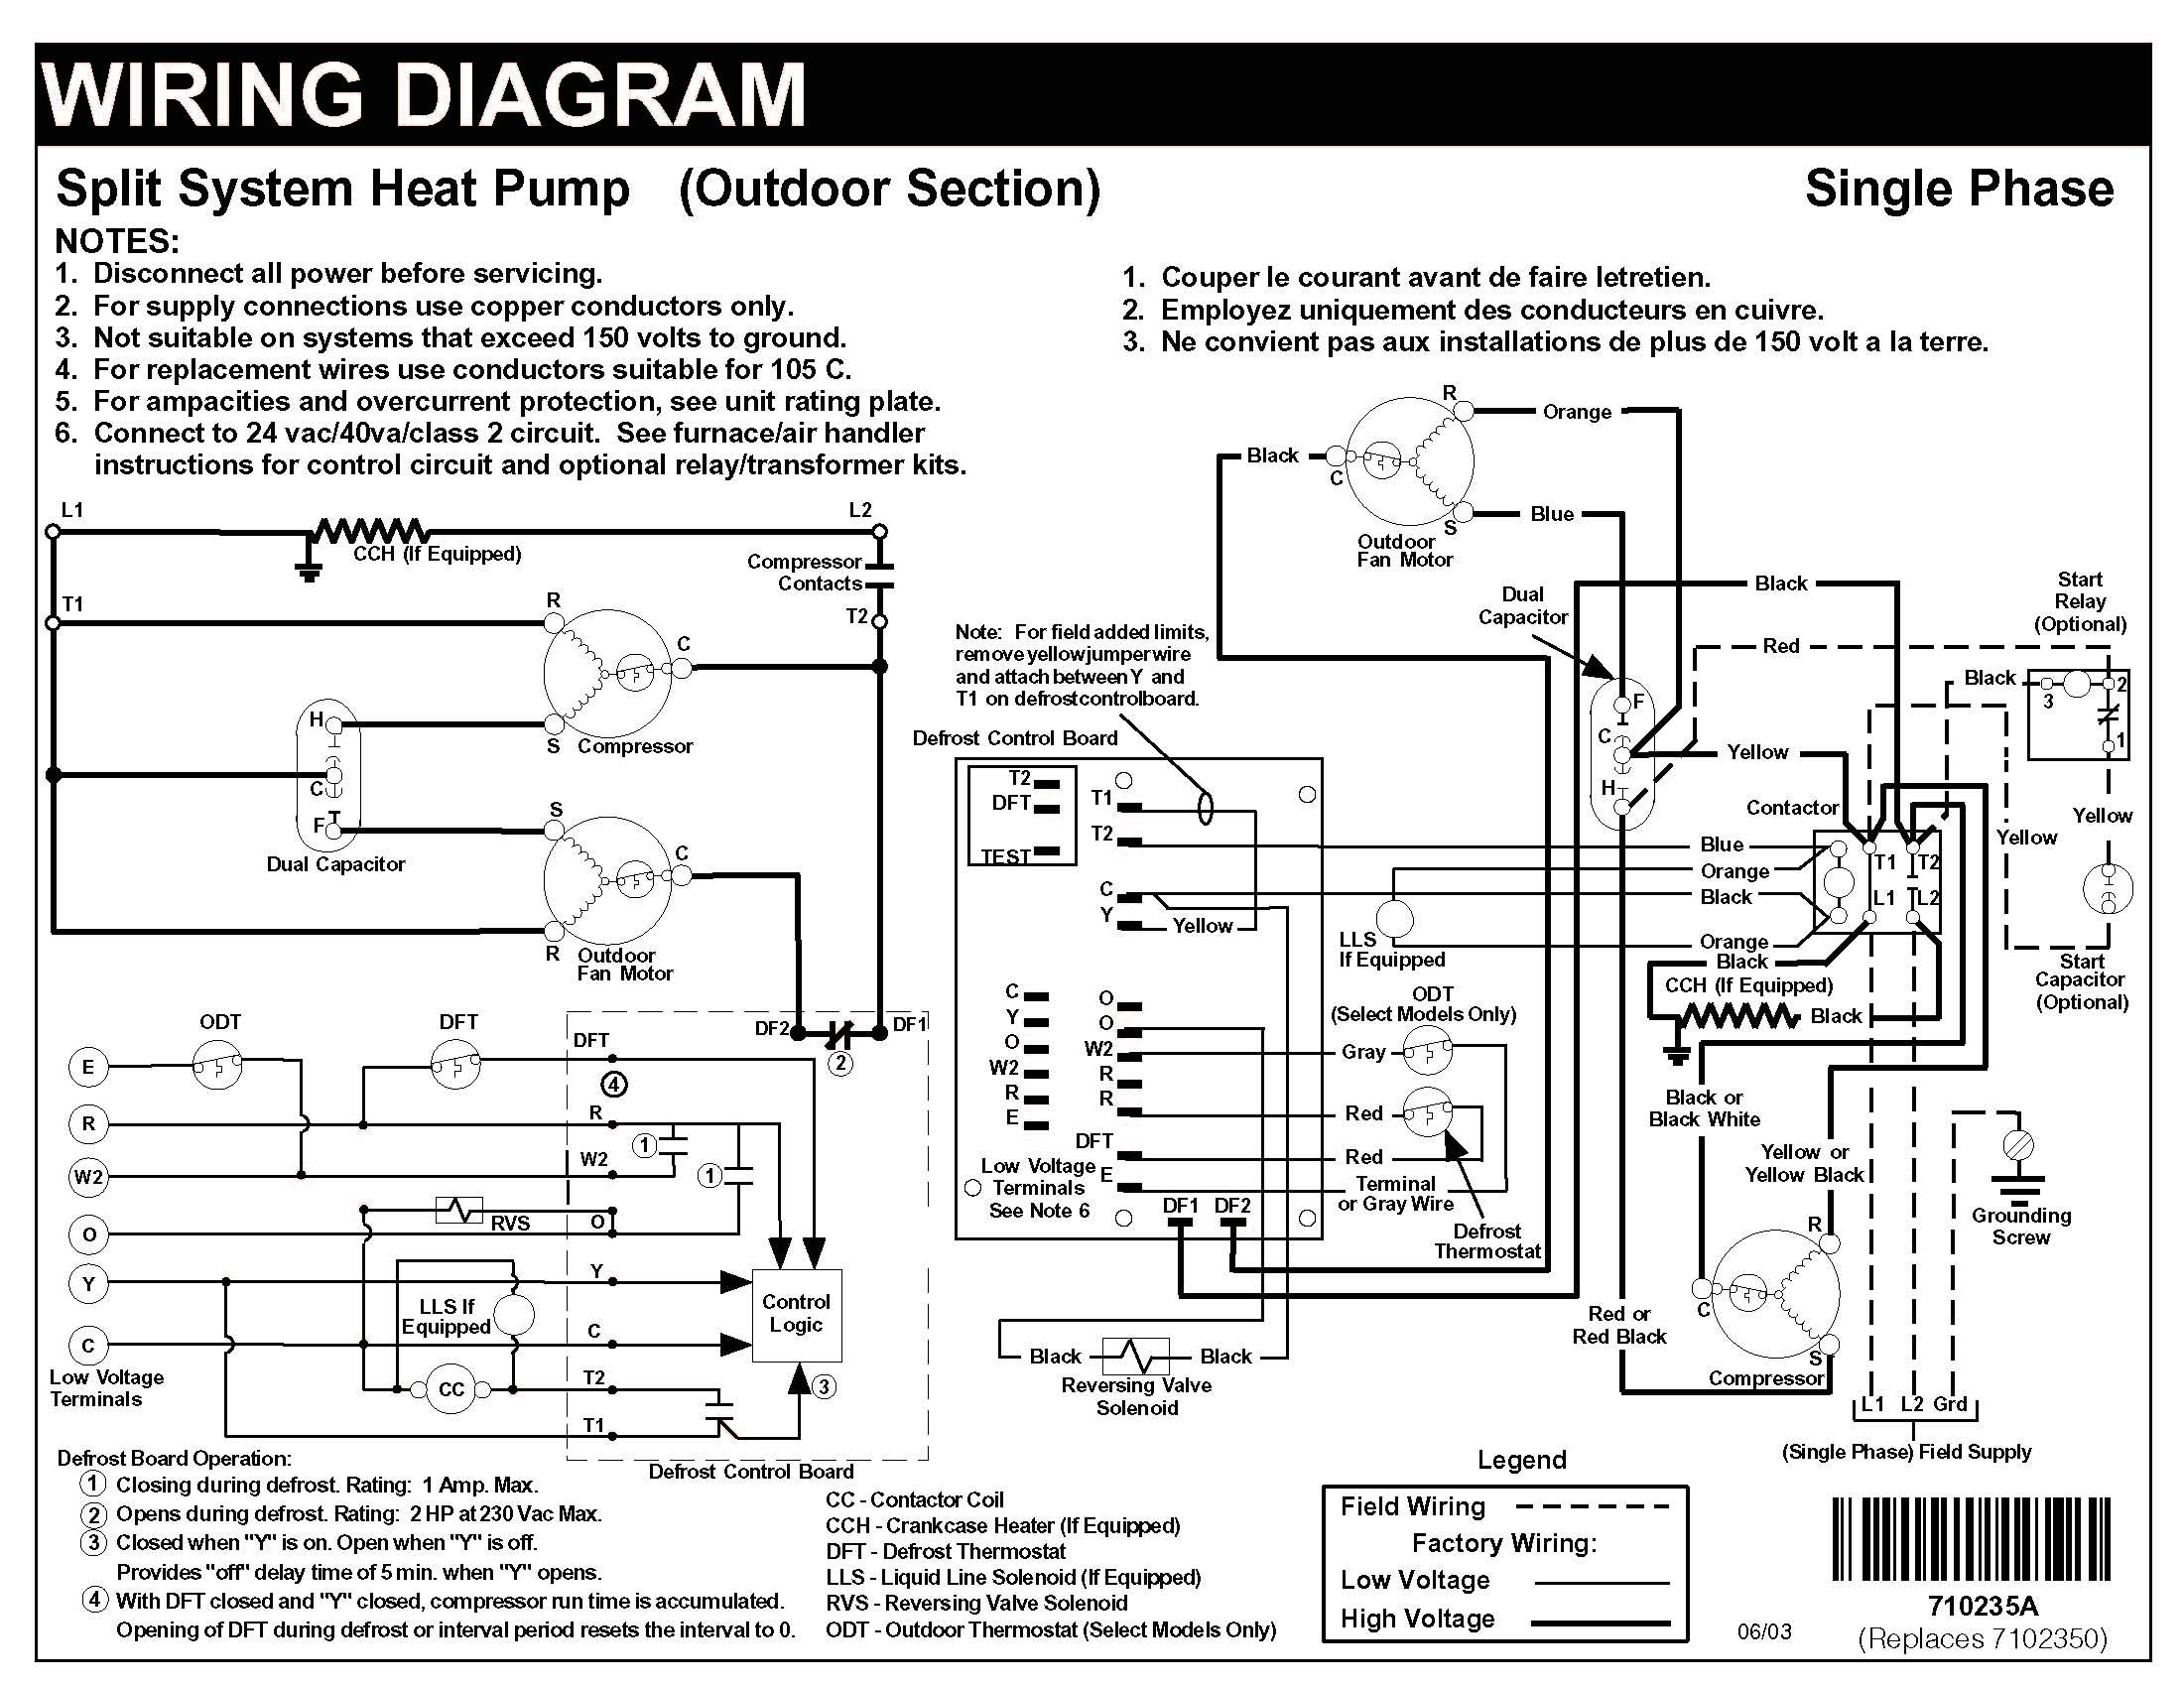 small resolution of lennox heat pump diagram wiring diagrams scematic lennox cbx diagram heat pumps residential heat pumps heat